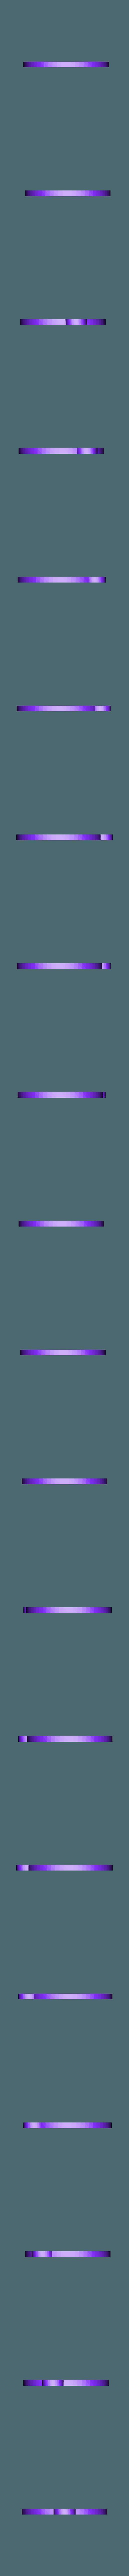 bts.STL Download free STL file BTS KEYBOARD • 3D printable object, Lubal